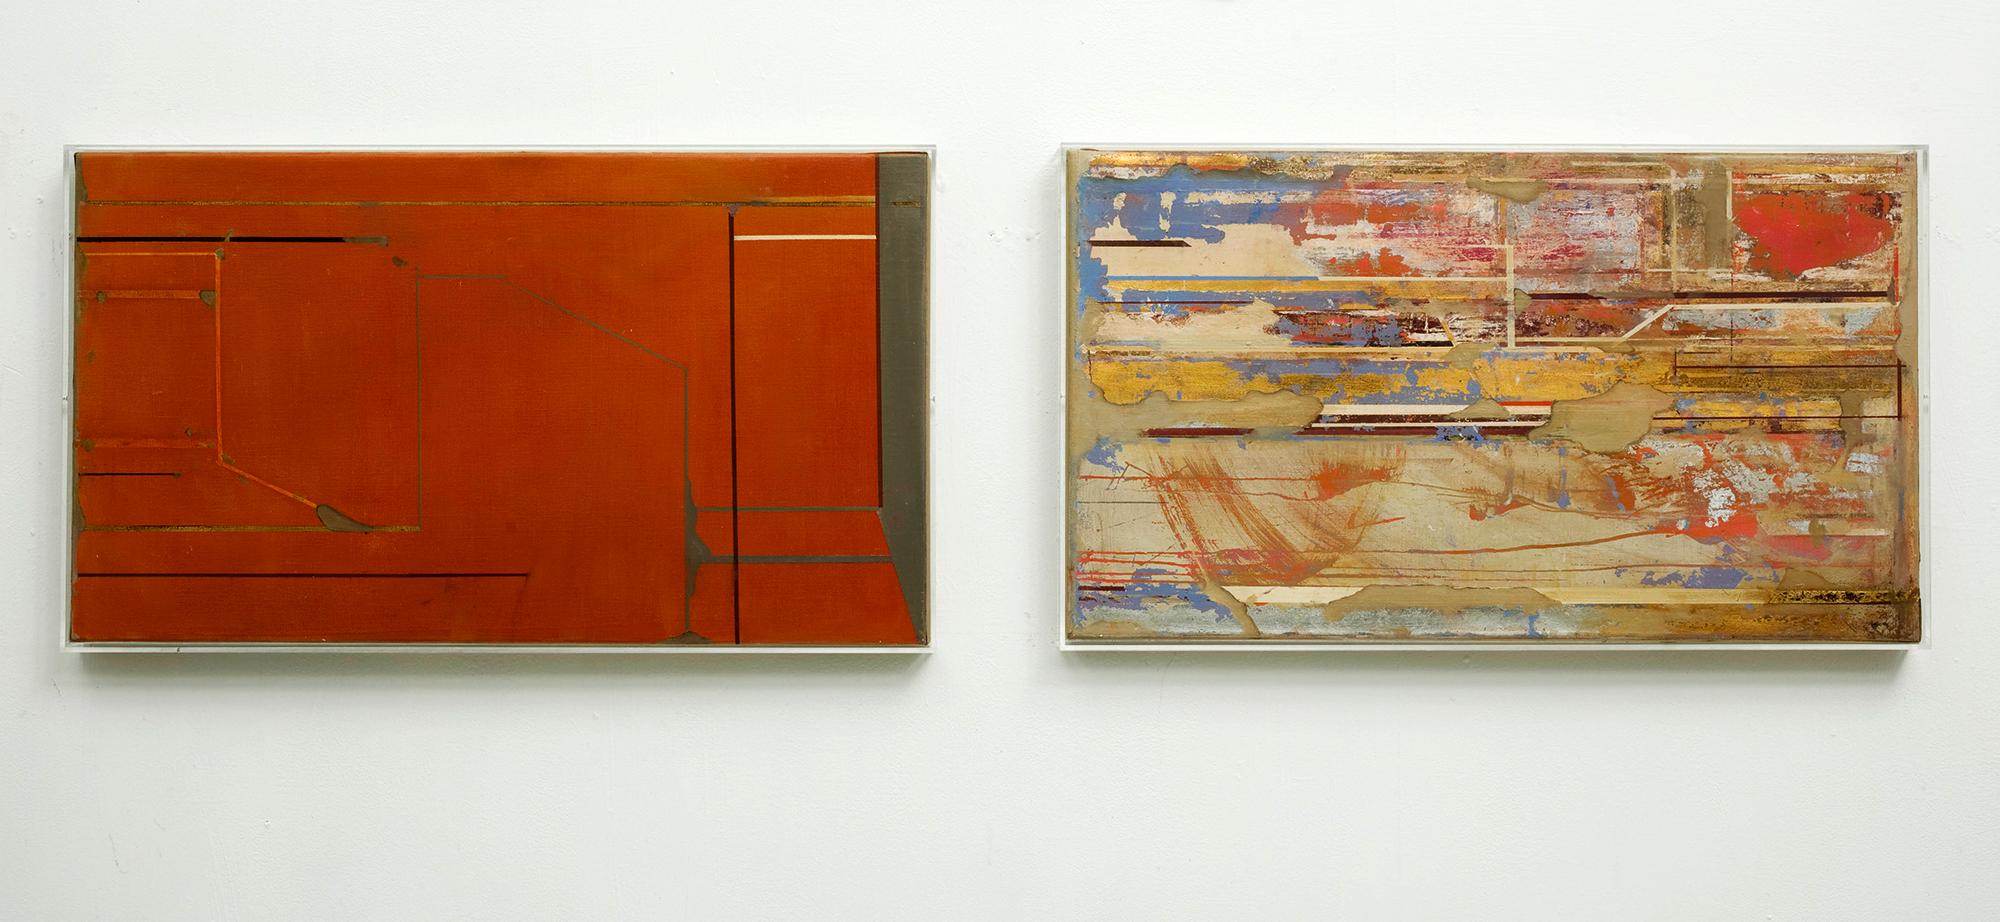 Spor av tid, 2013 - 50 x 70 cm x 2. Tromsø Kunsthall